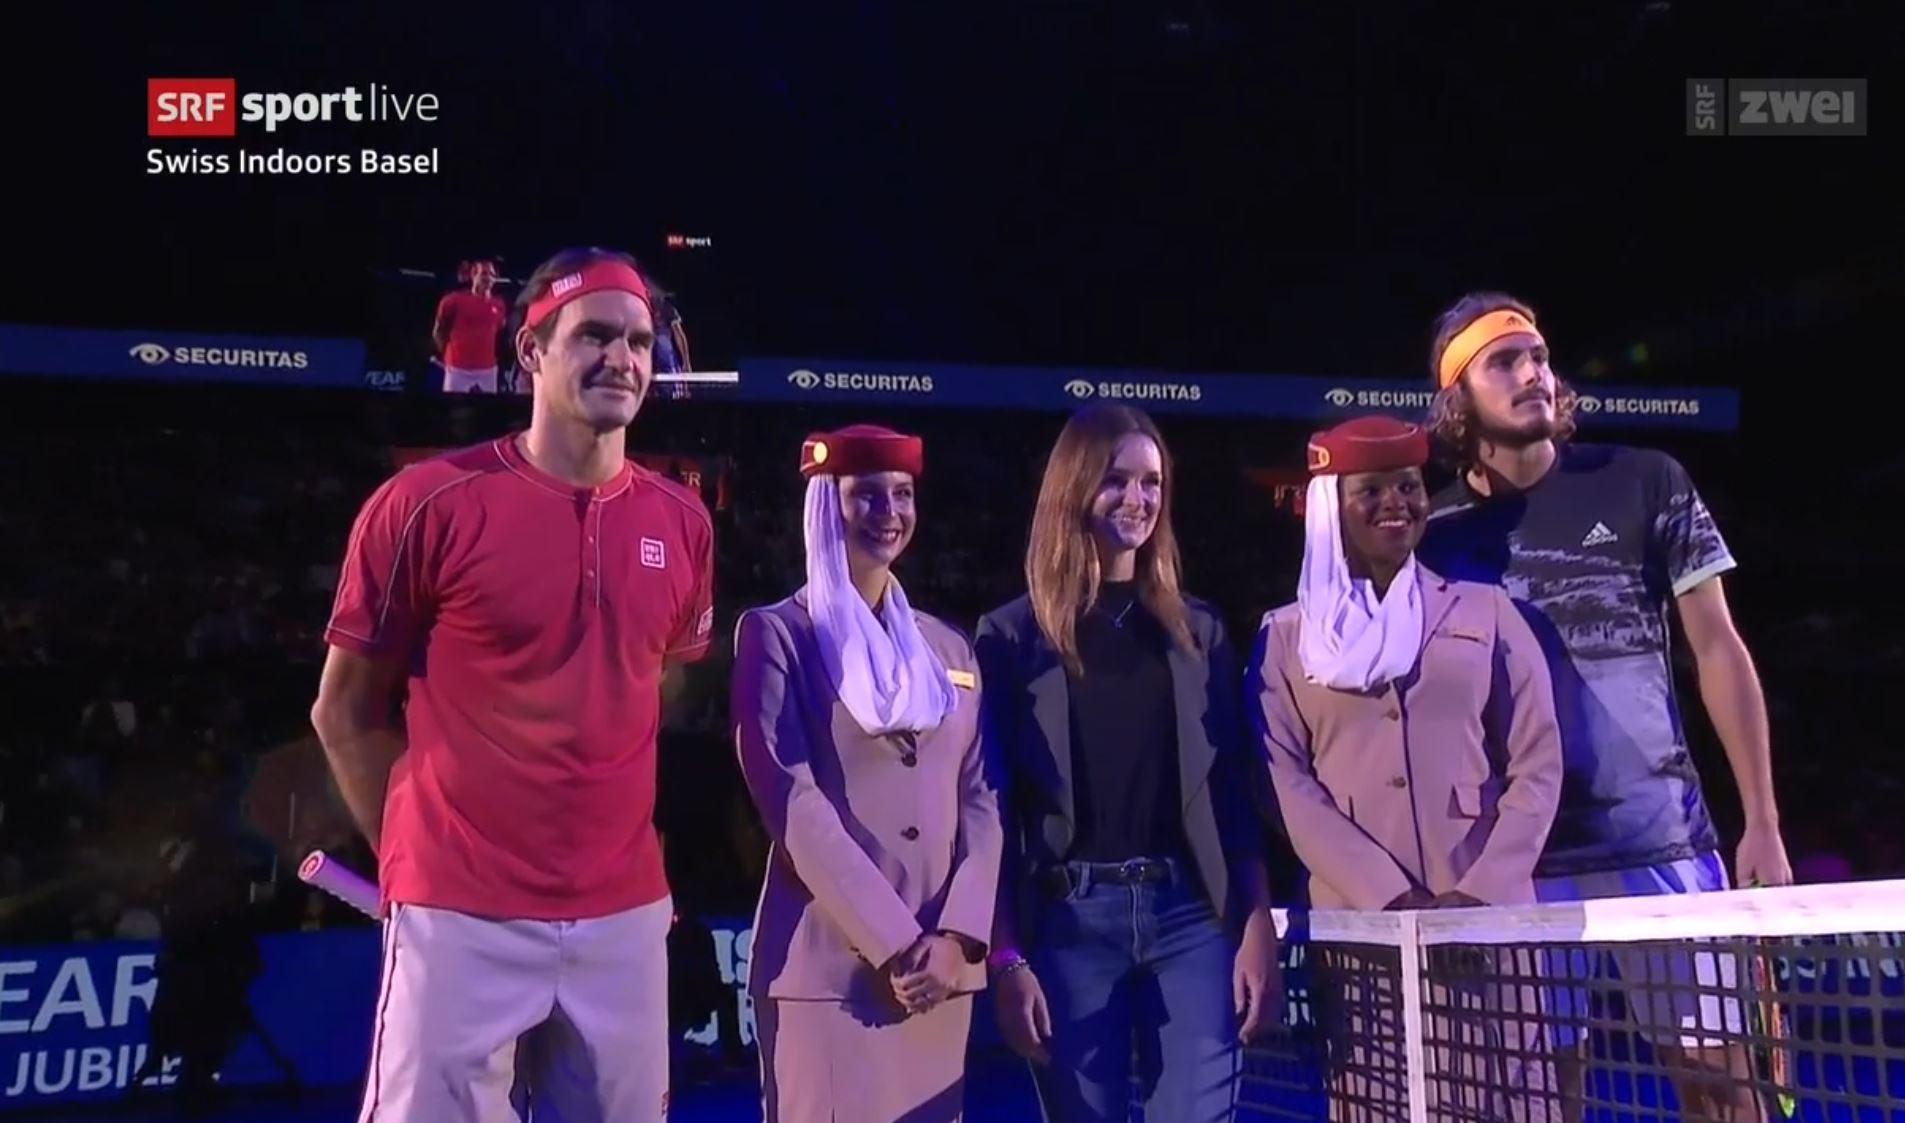 Swiss Indoors Coin Toss Roger Federer